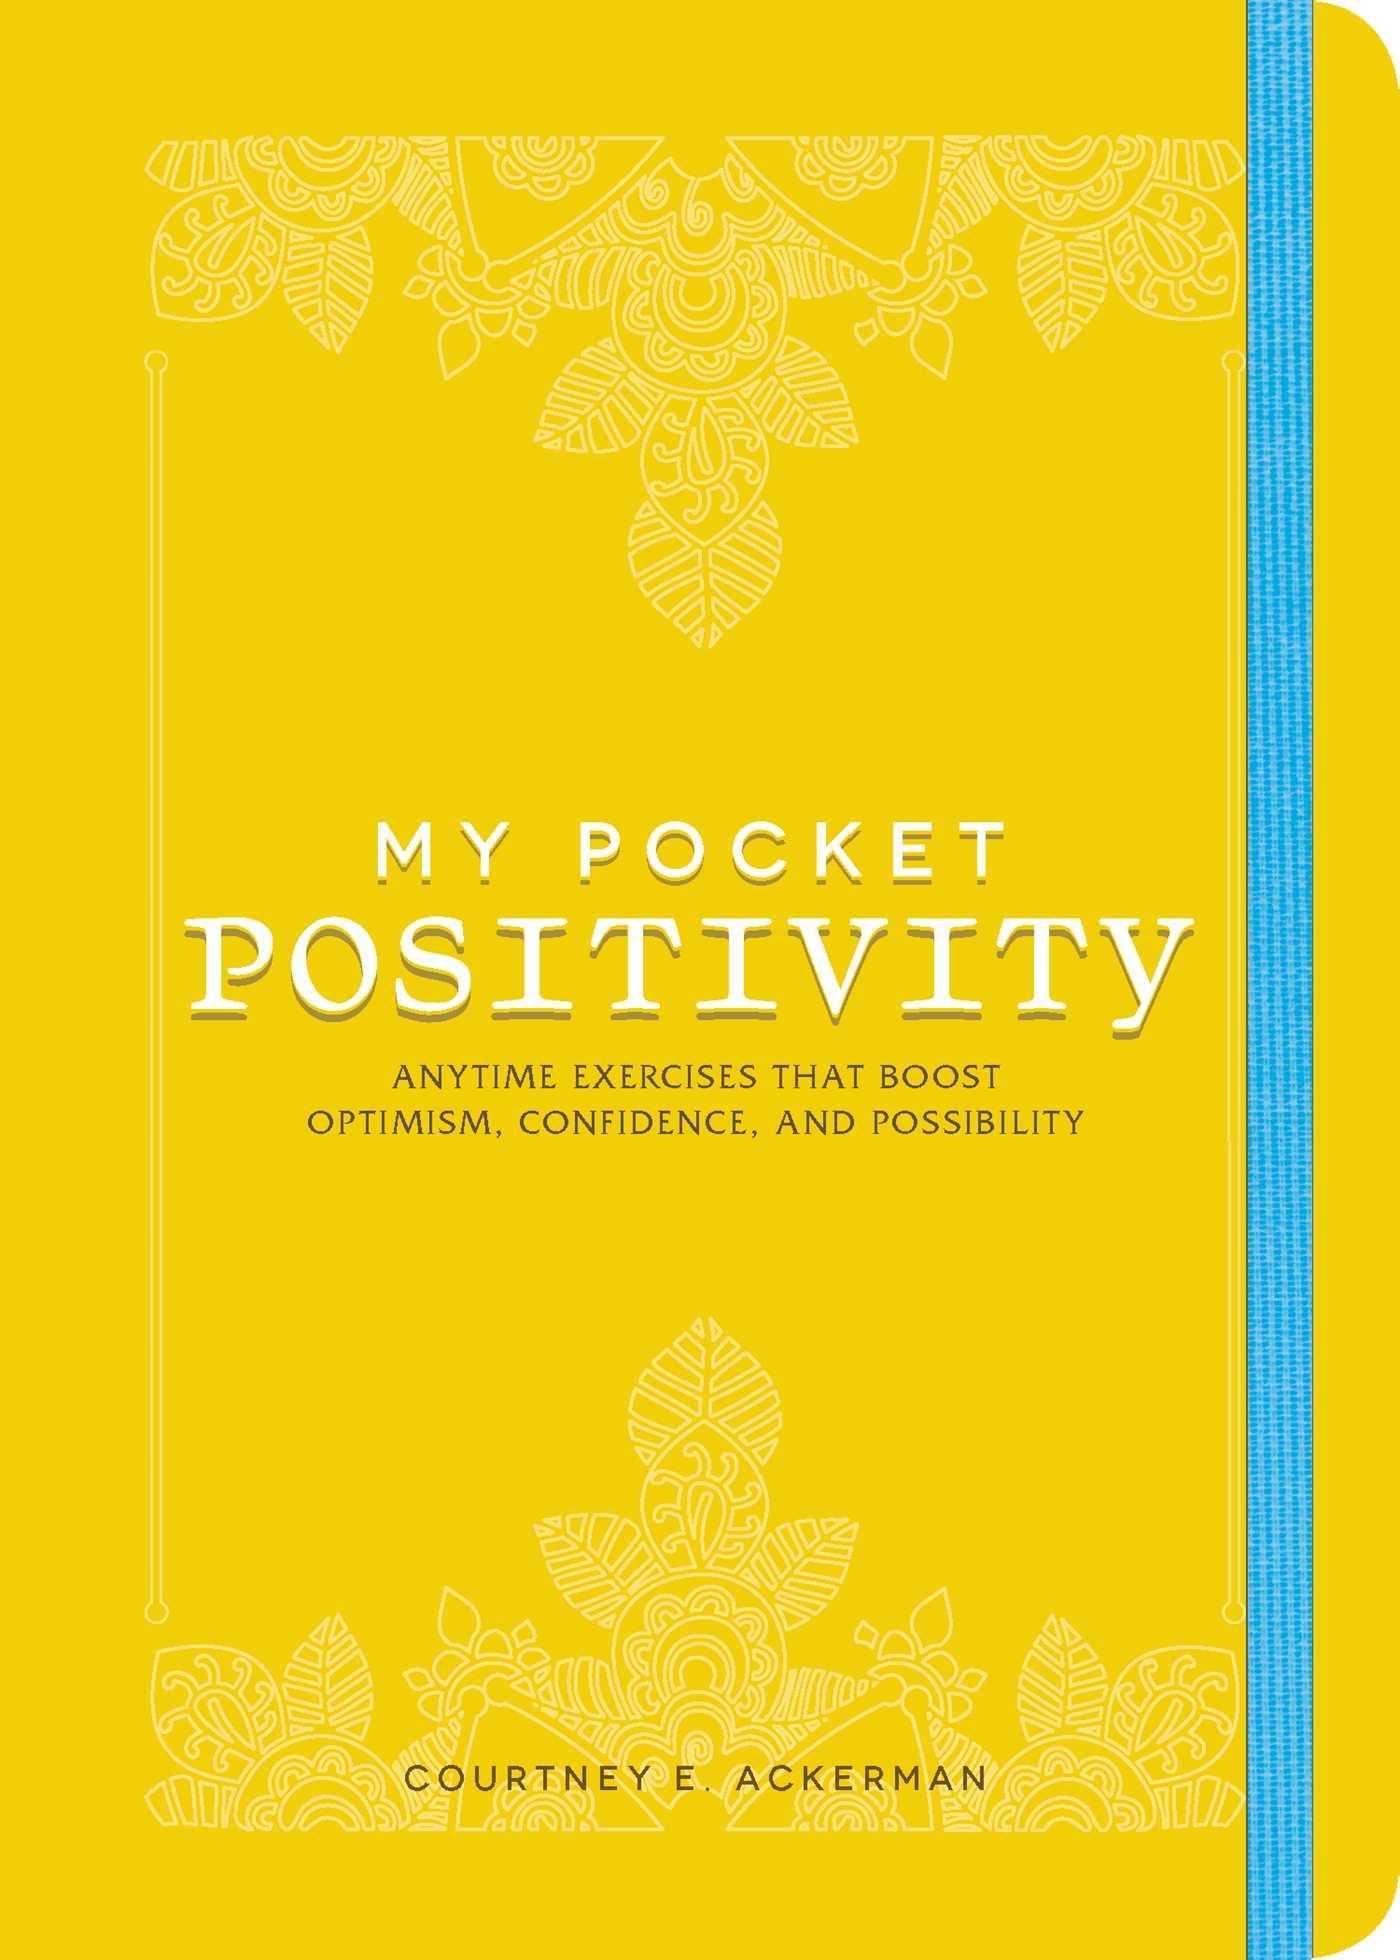 My pocket positivity 9781507208502 hr